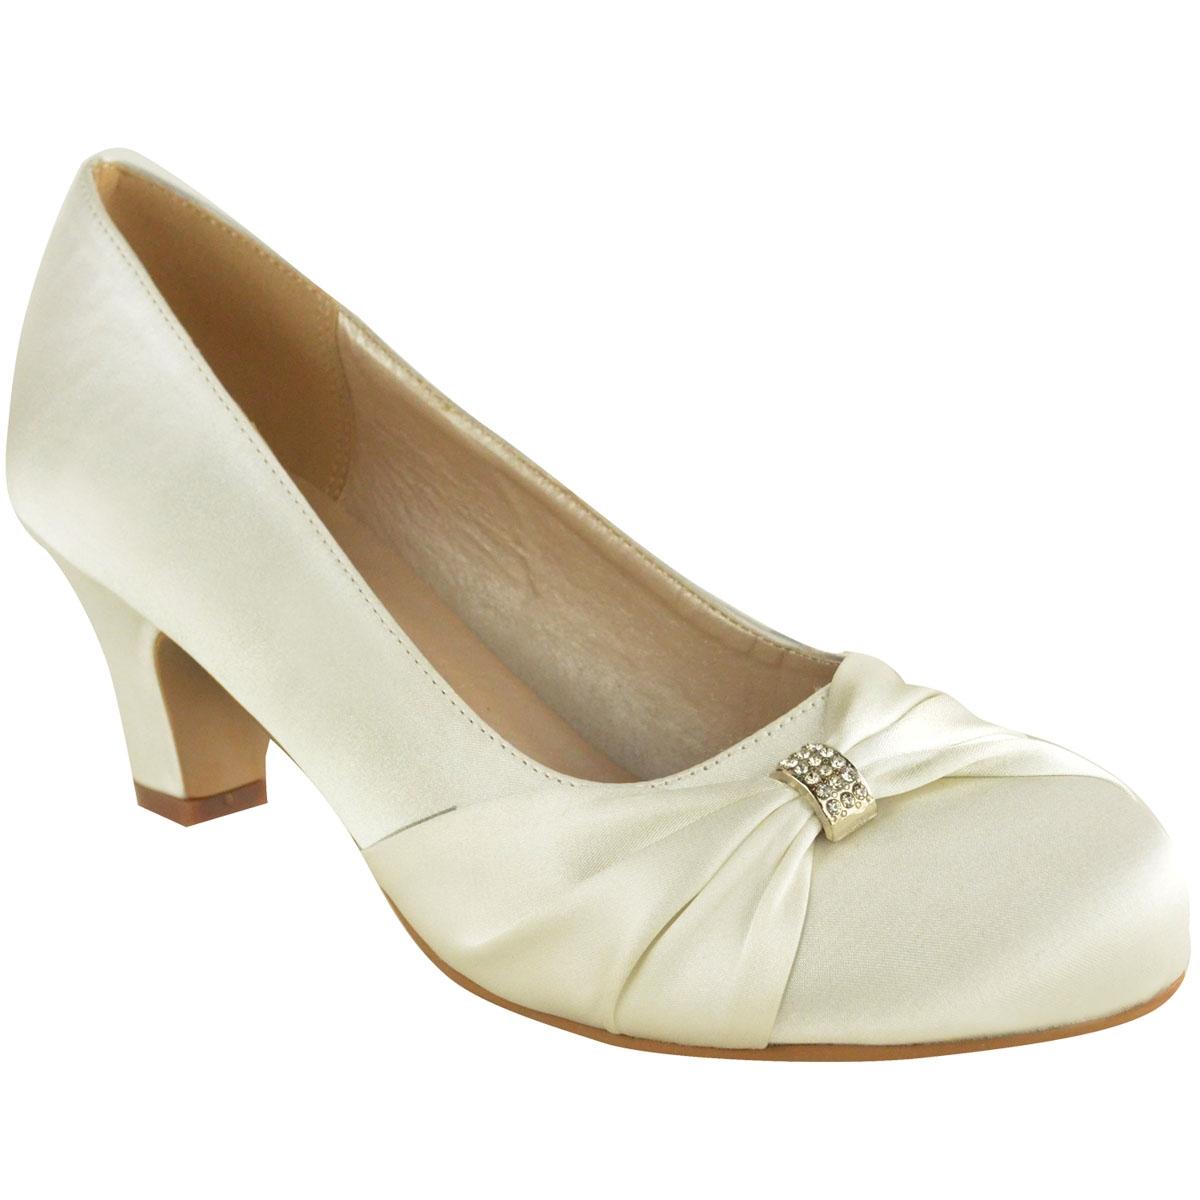 e1234fd7 Liva satin festsko, ivory: Søde satin sko i ivory med en lille hæl ...